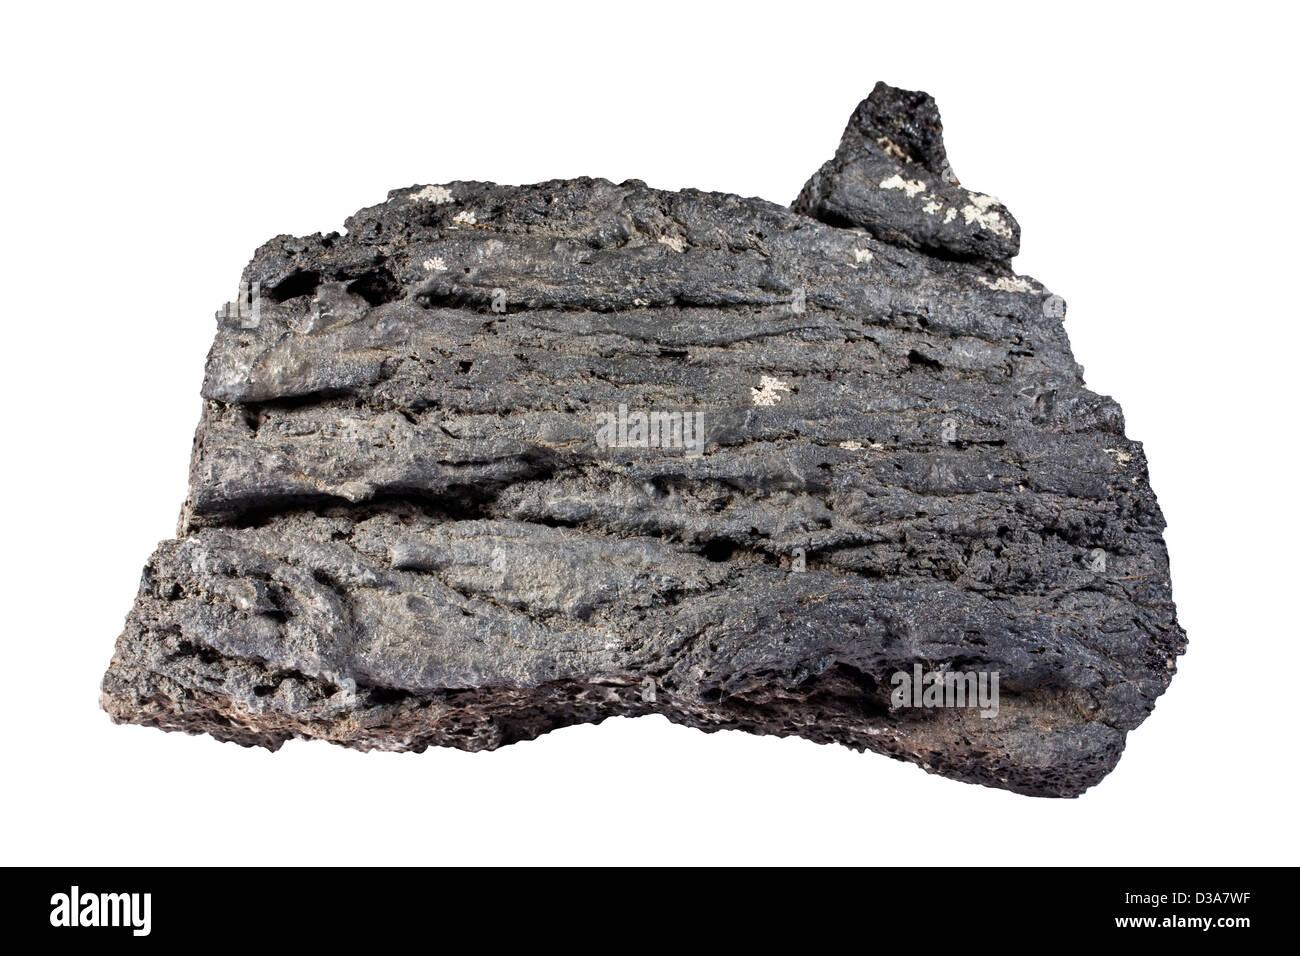 Pahoehoe ropy lava fragment - Stock Image